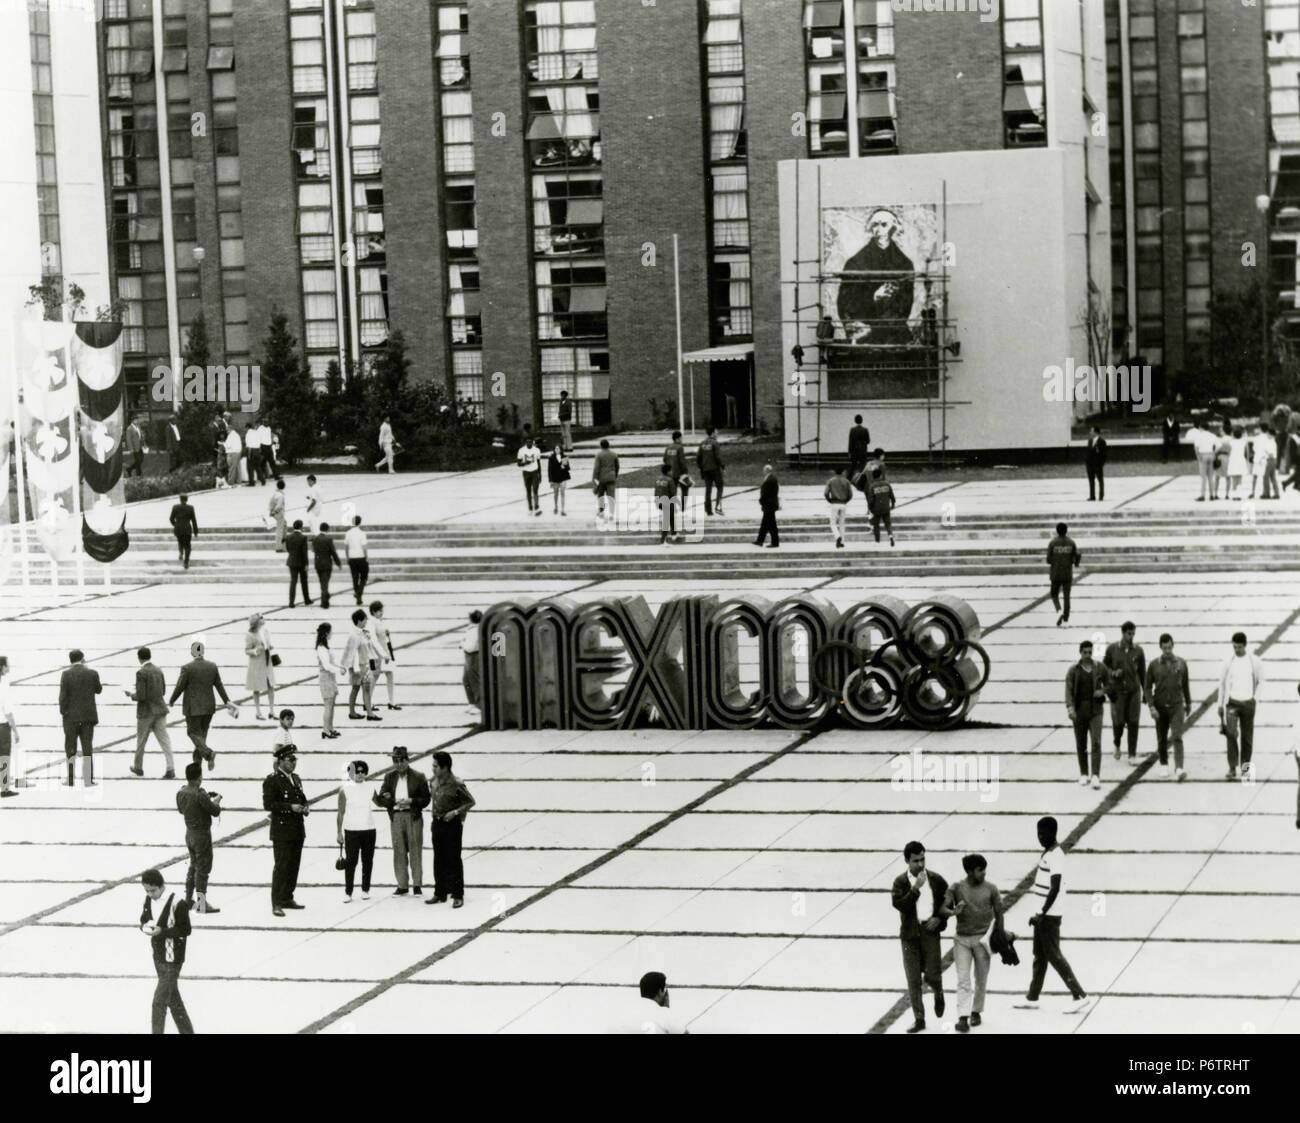 Mexico 68 Olympics Square, 1968 - Stock Image